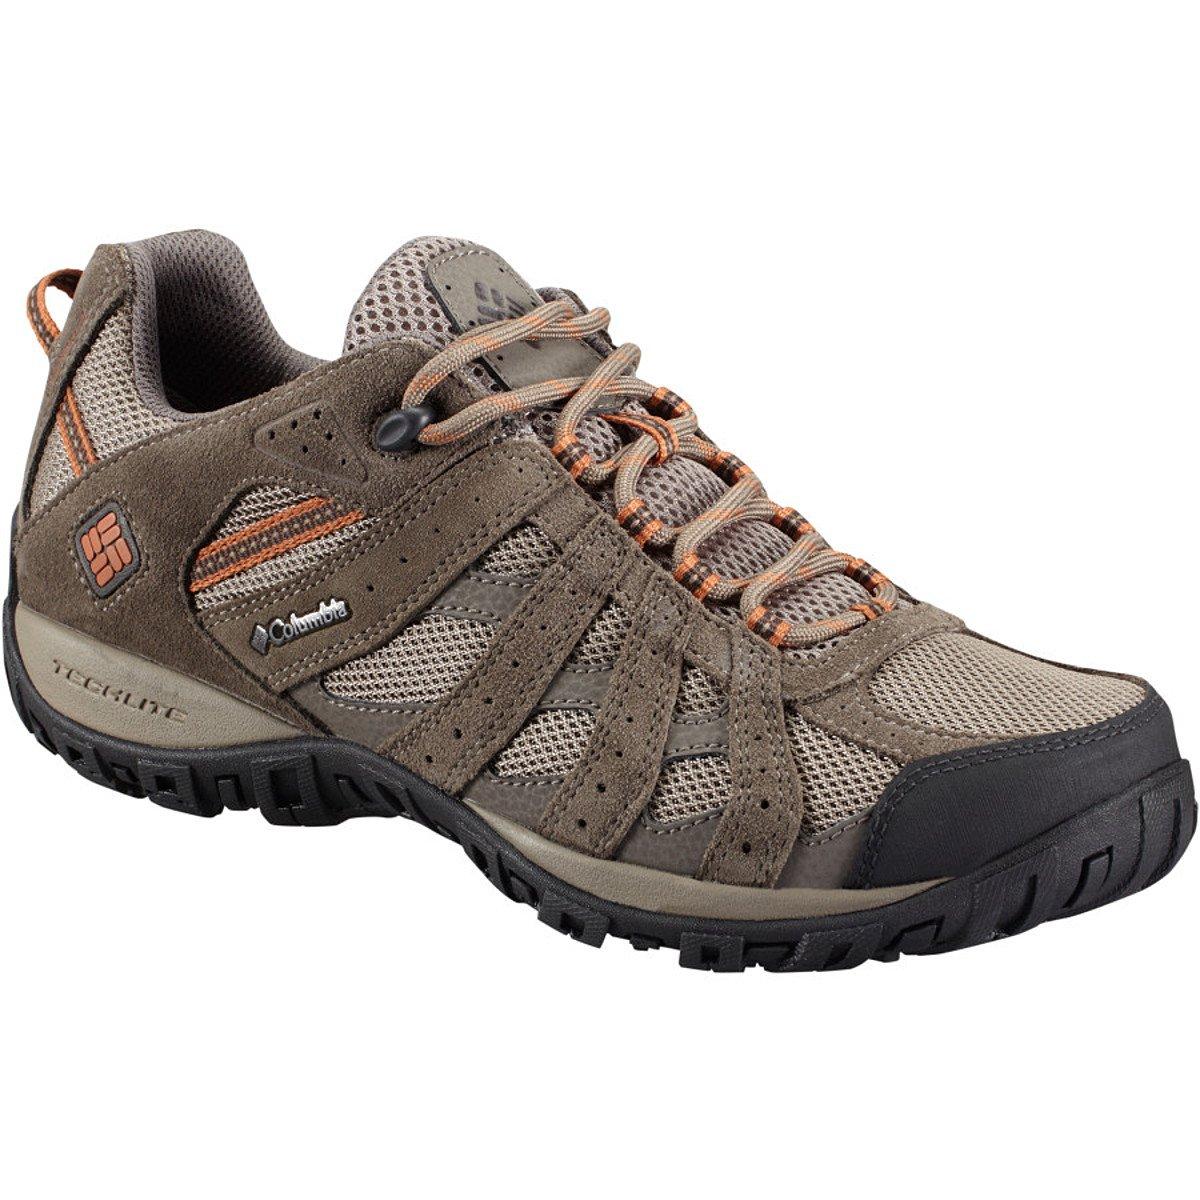 Columbia Men's Redmond Waterproof Hiking Shoe, Pebble, Dark Ginger, 13 D US by Columbia